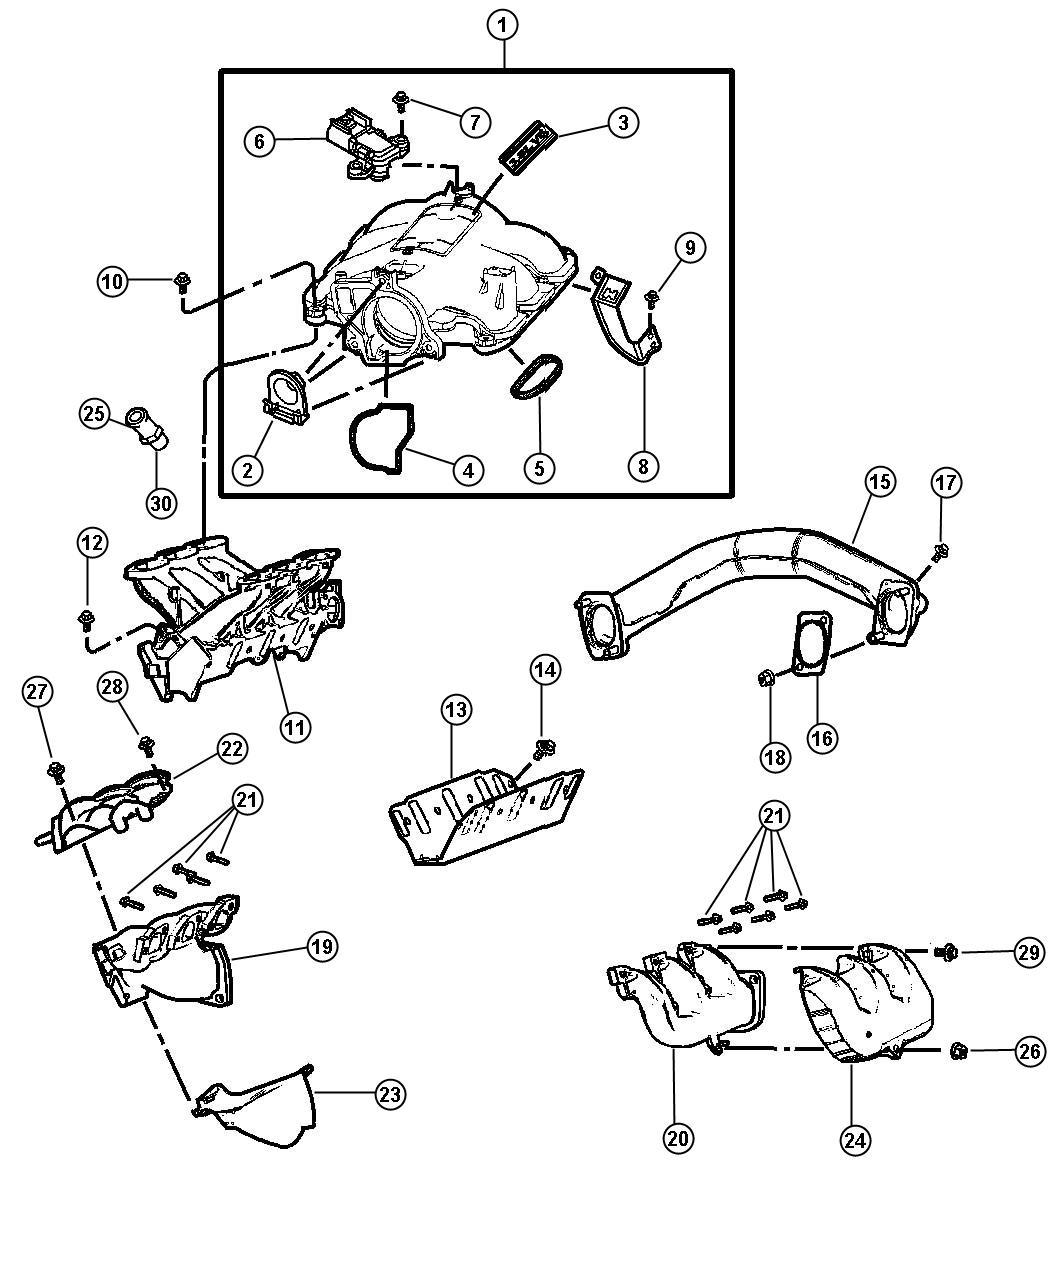 2010 Ford Fusion Fuse Diagram